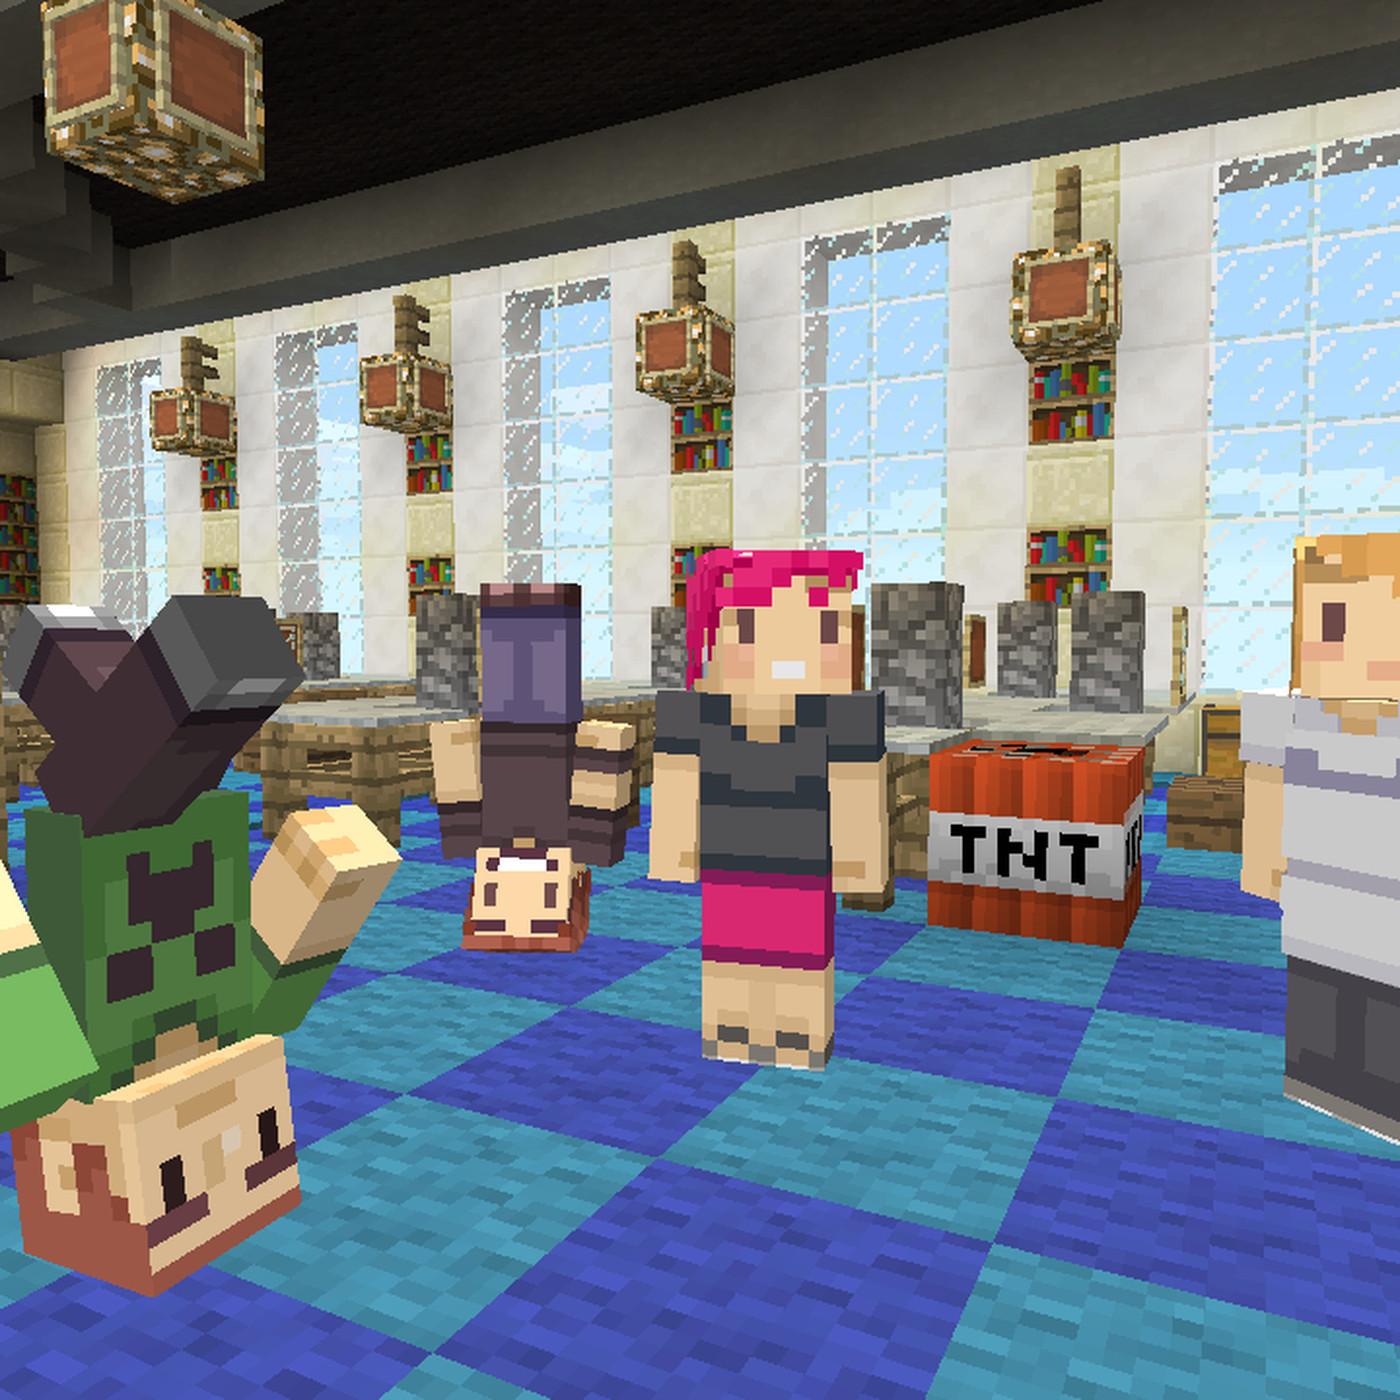 Free Minecraft skins hit Xbox to celebrate three years on